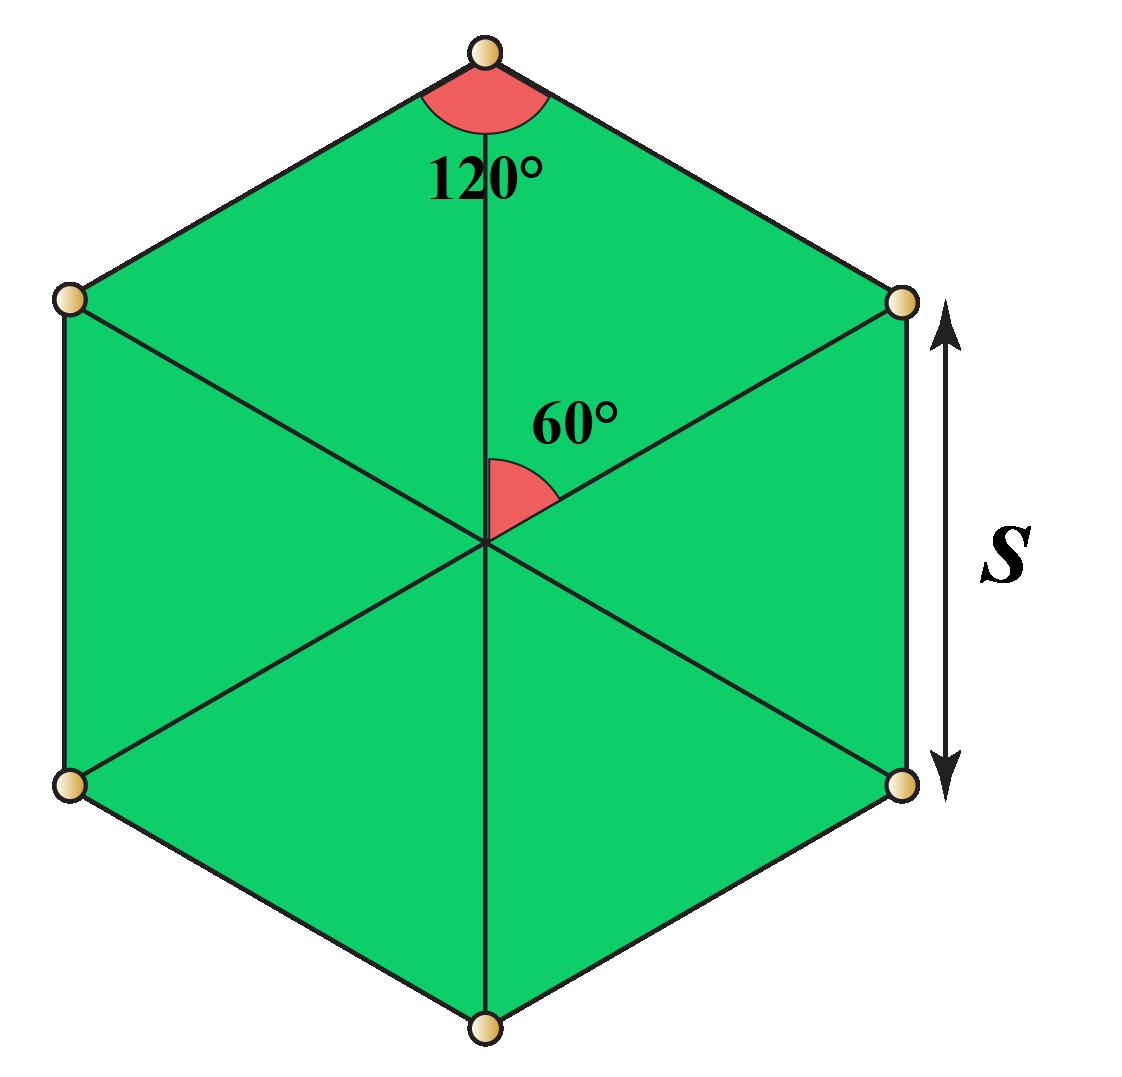 Regular Hexagon with Internal Angles Marked